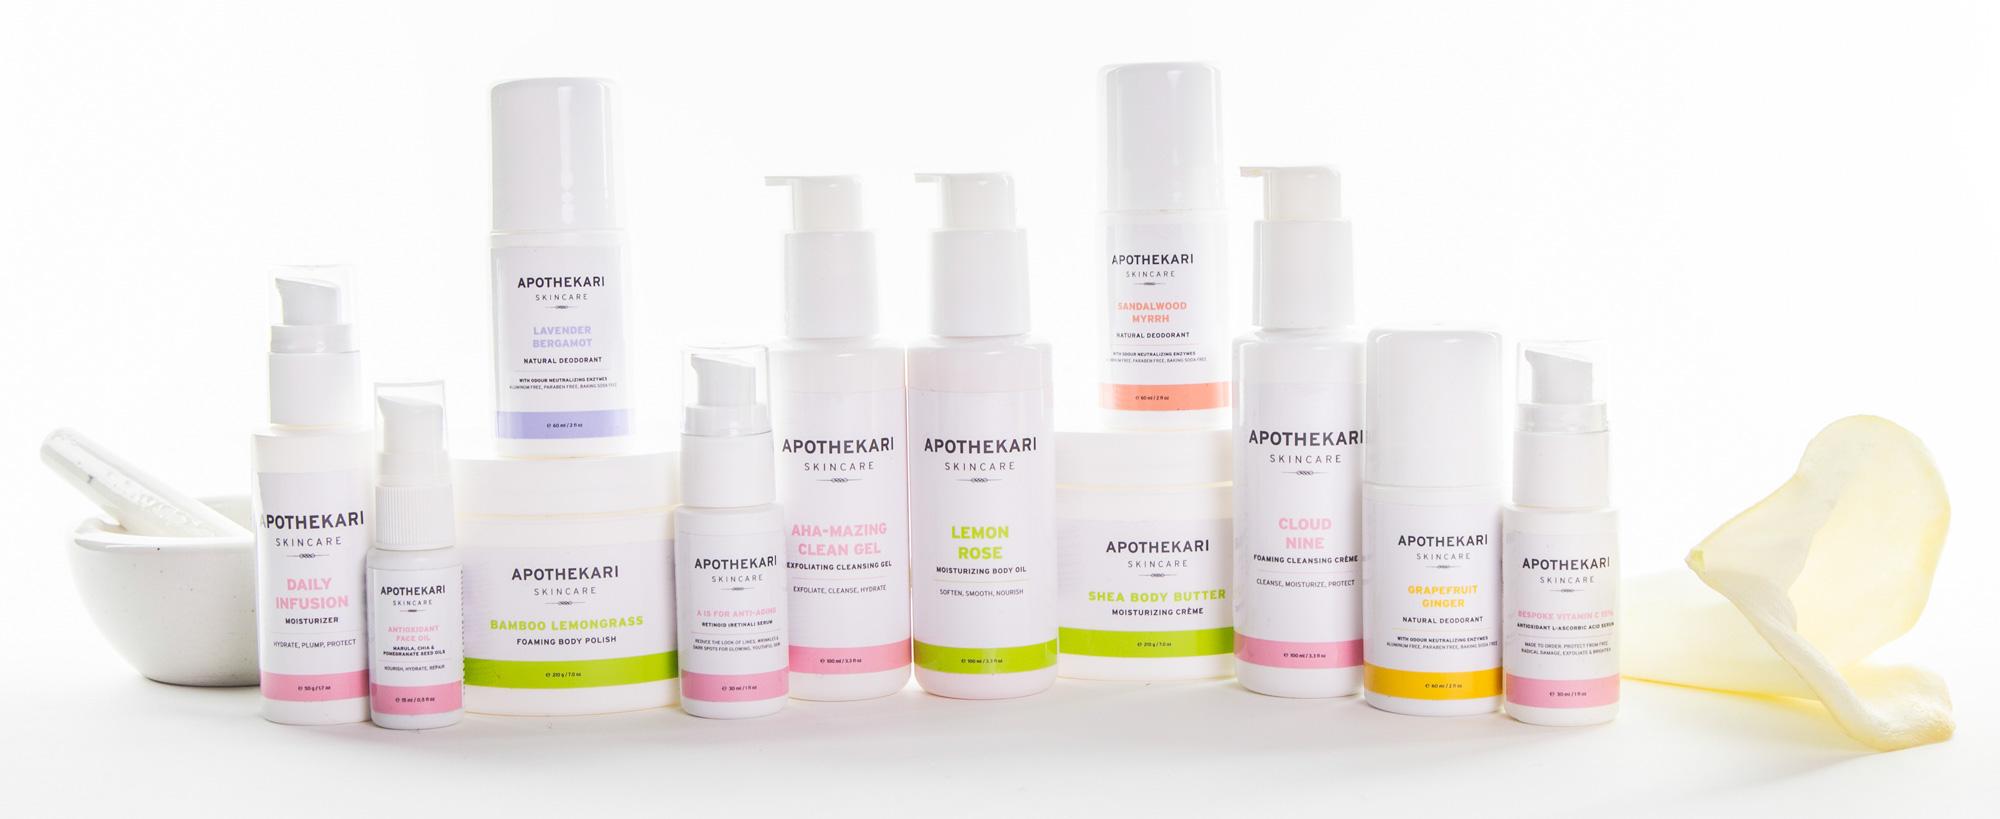 Apothekari Skincare Brand Canada